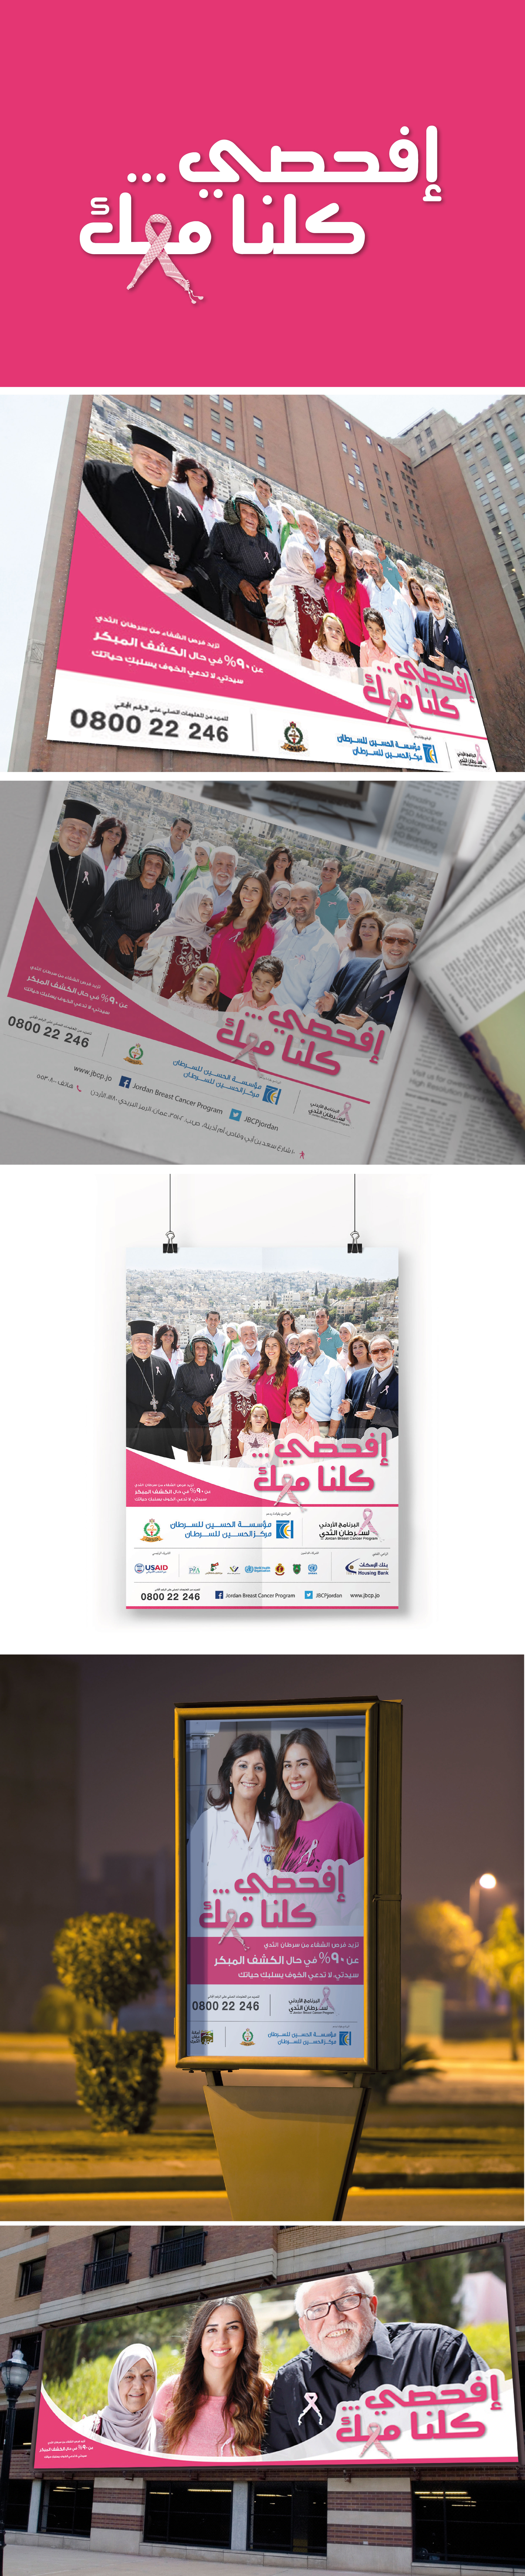 Jordanian Breast Cancer Program